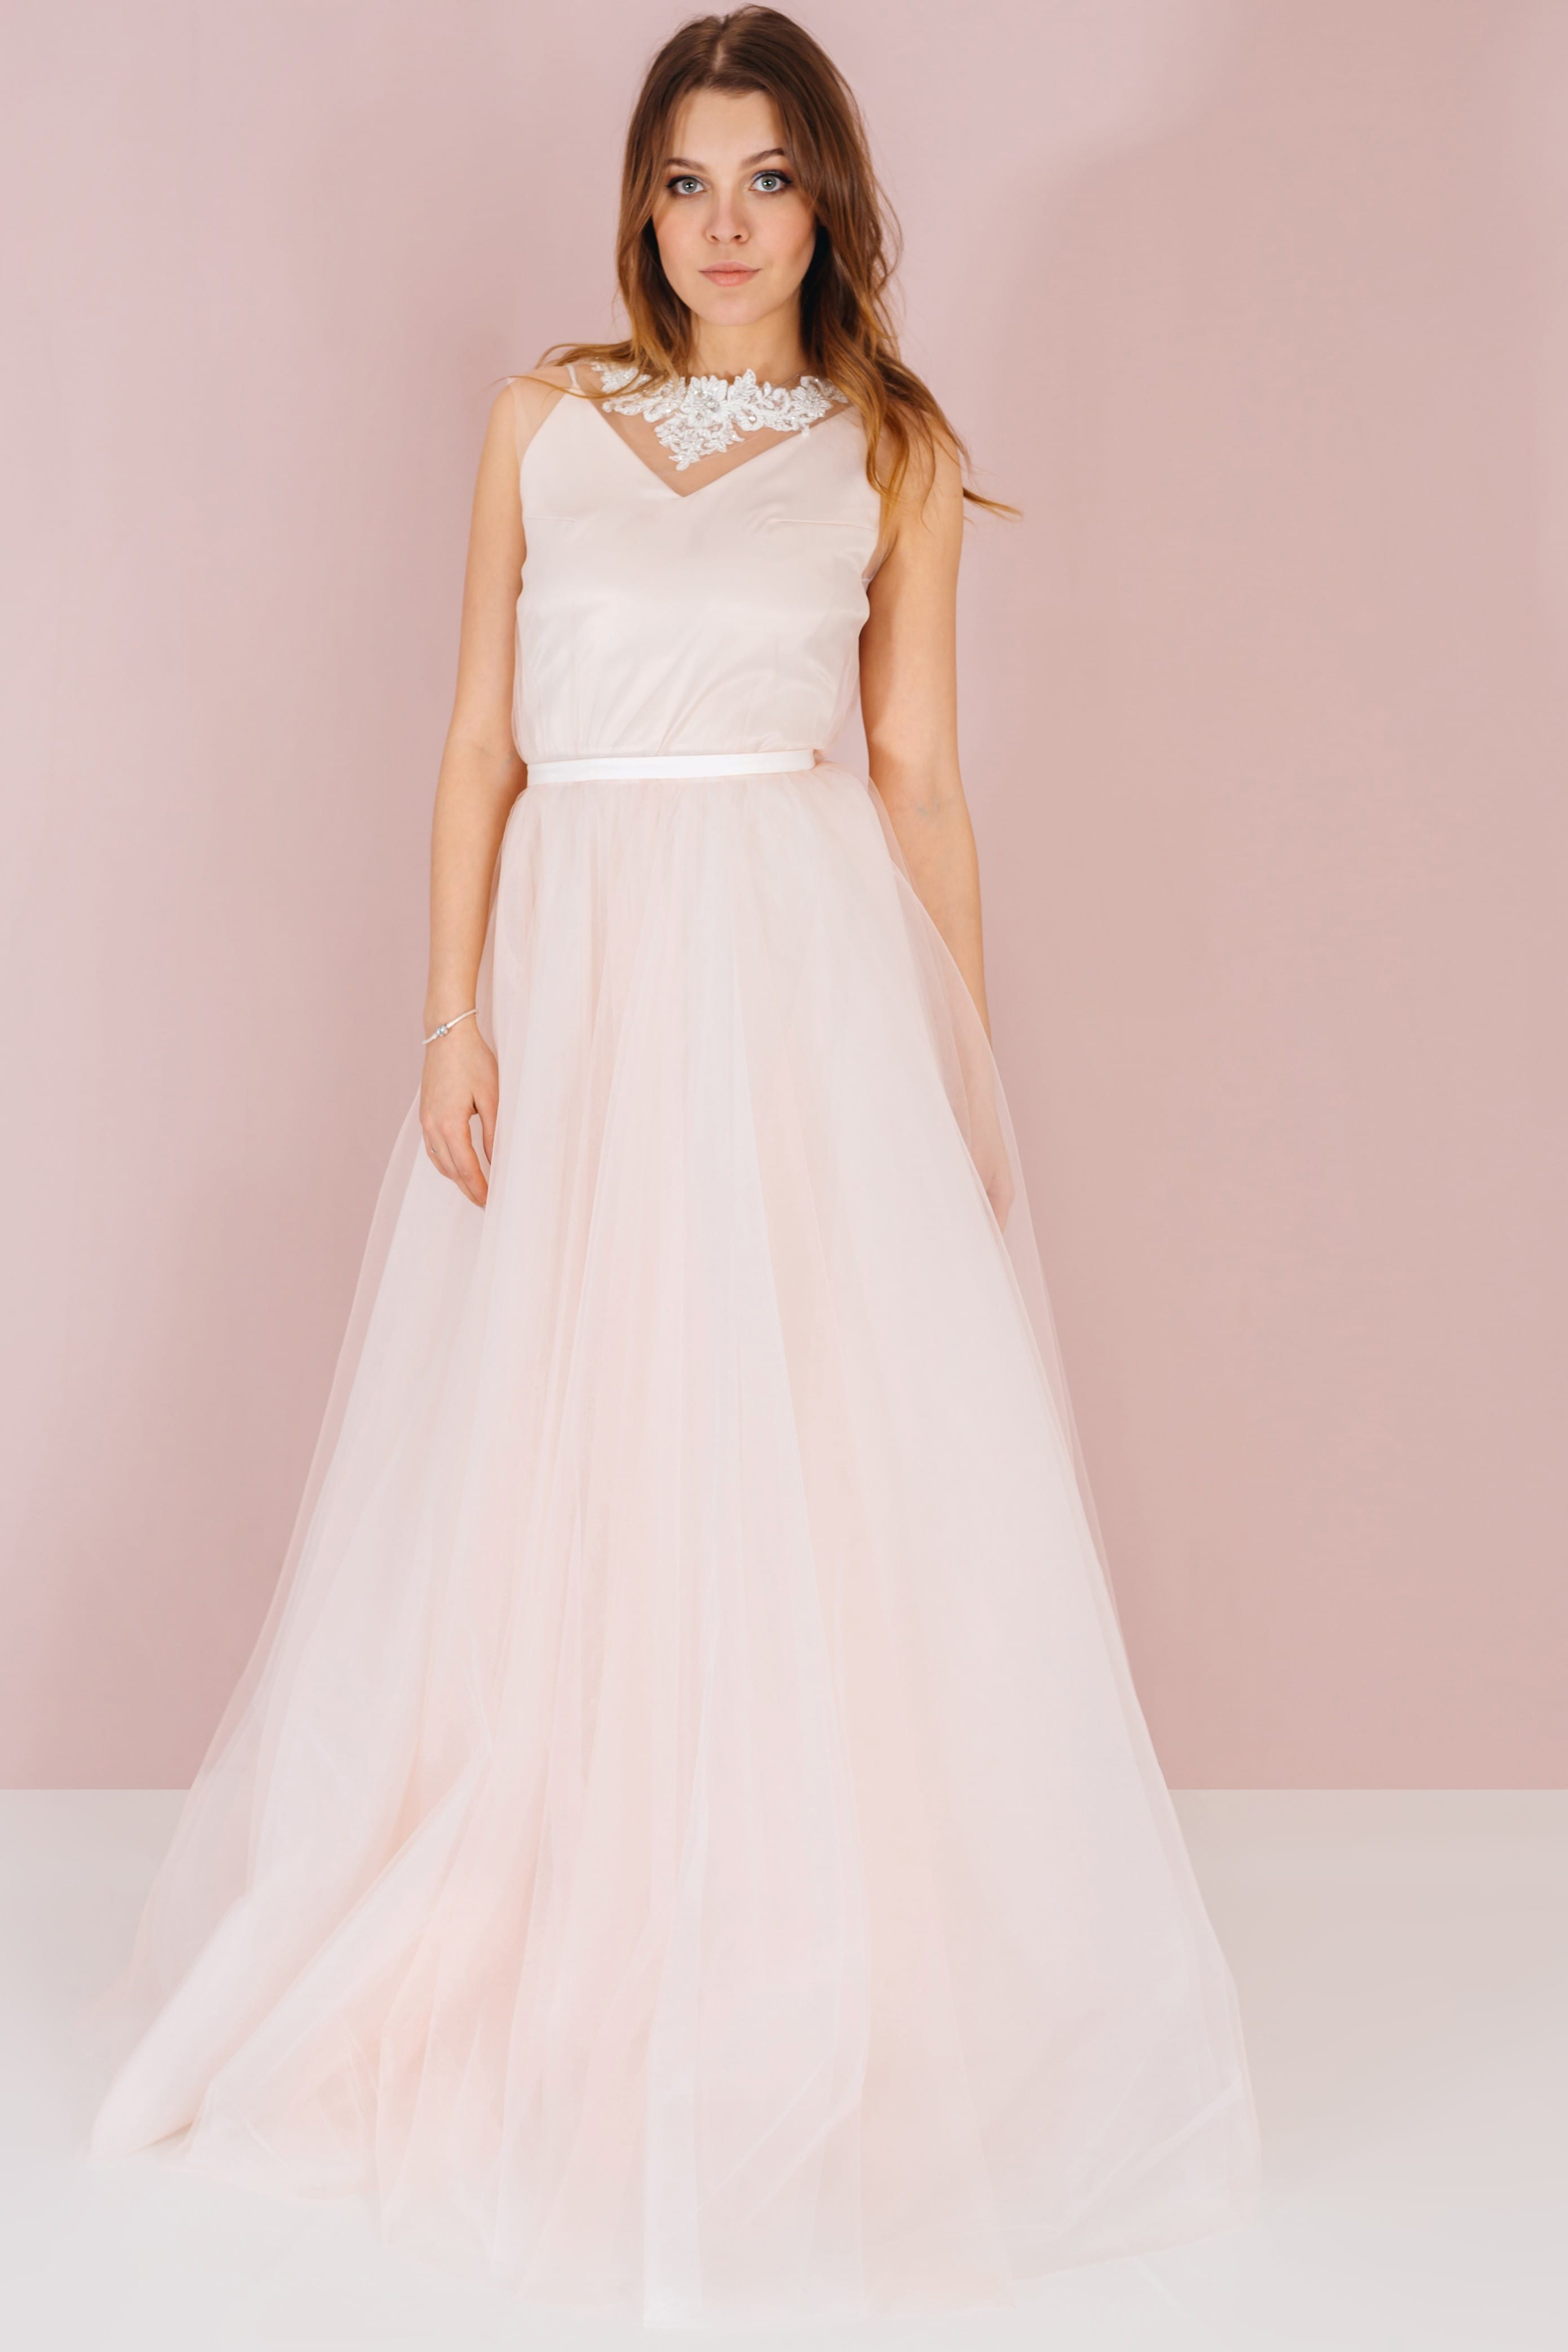 Свадебное платье HARMONY, коллекция LOFT, бренд RARE BRIDAL, фото 2